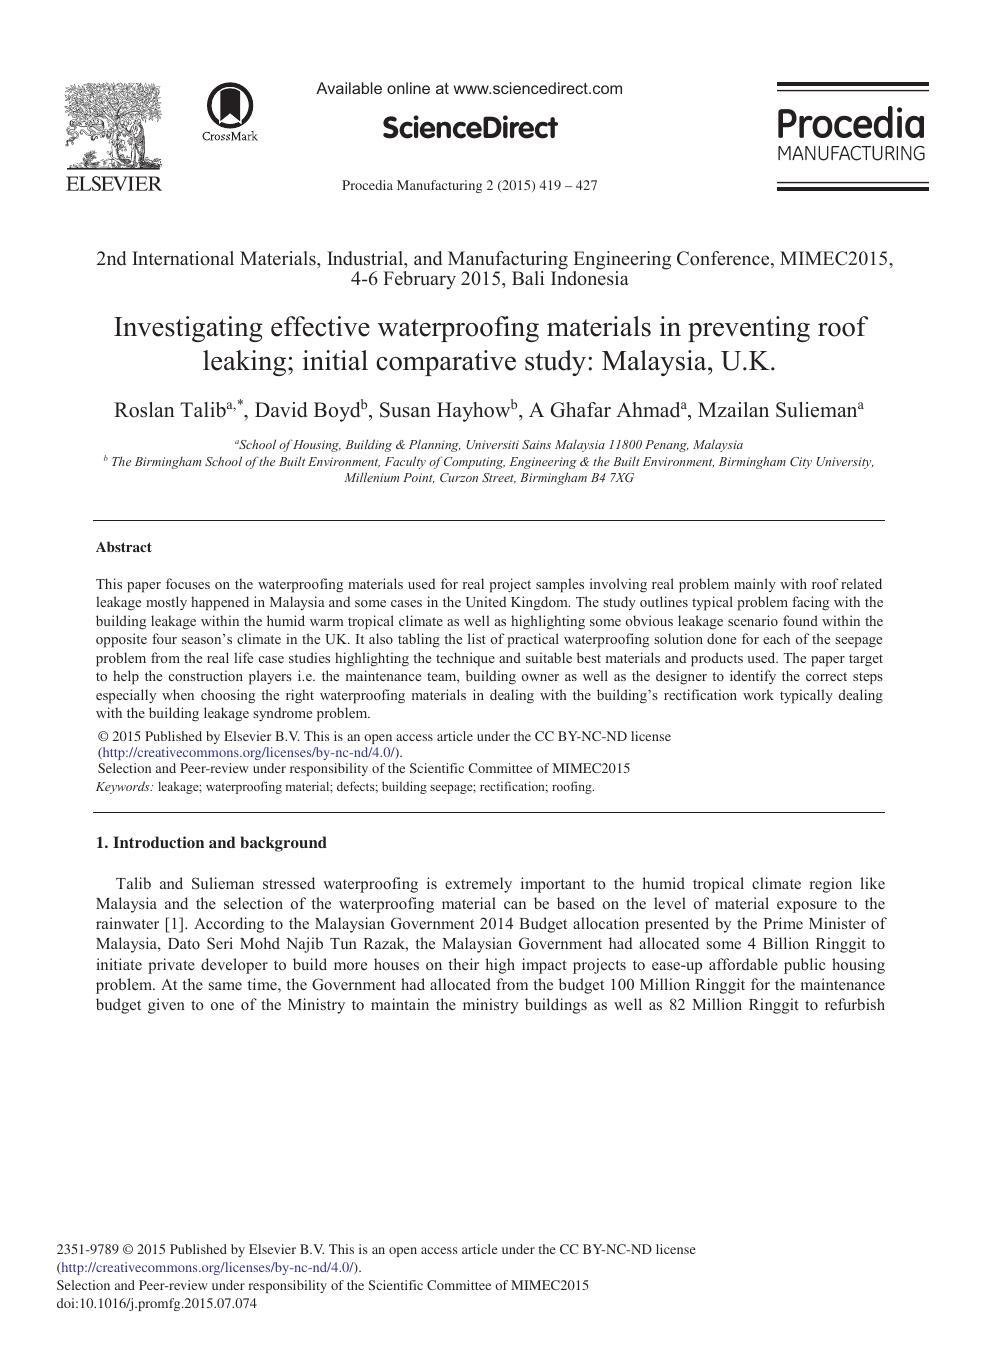 Investigating Effective Waterproofing Materials in Preventing Roof